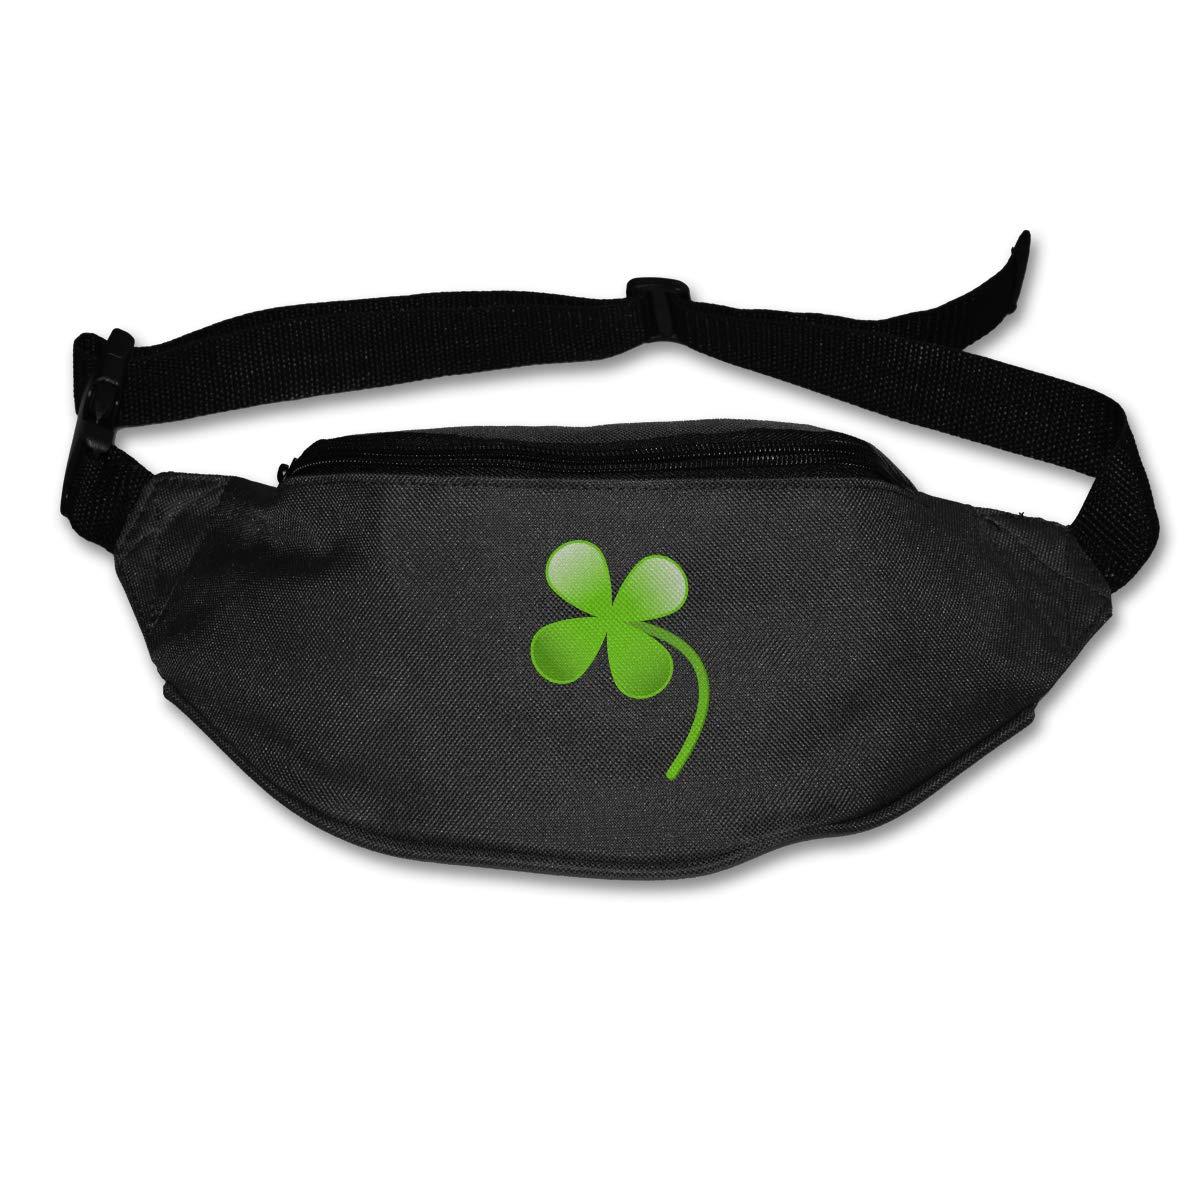 Small Fresh Clover Sport Waist Bag Fanny Pack Adjustable For Travel